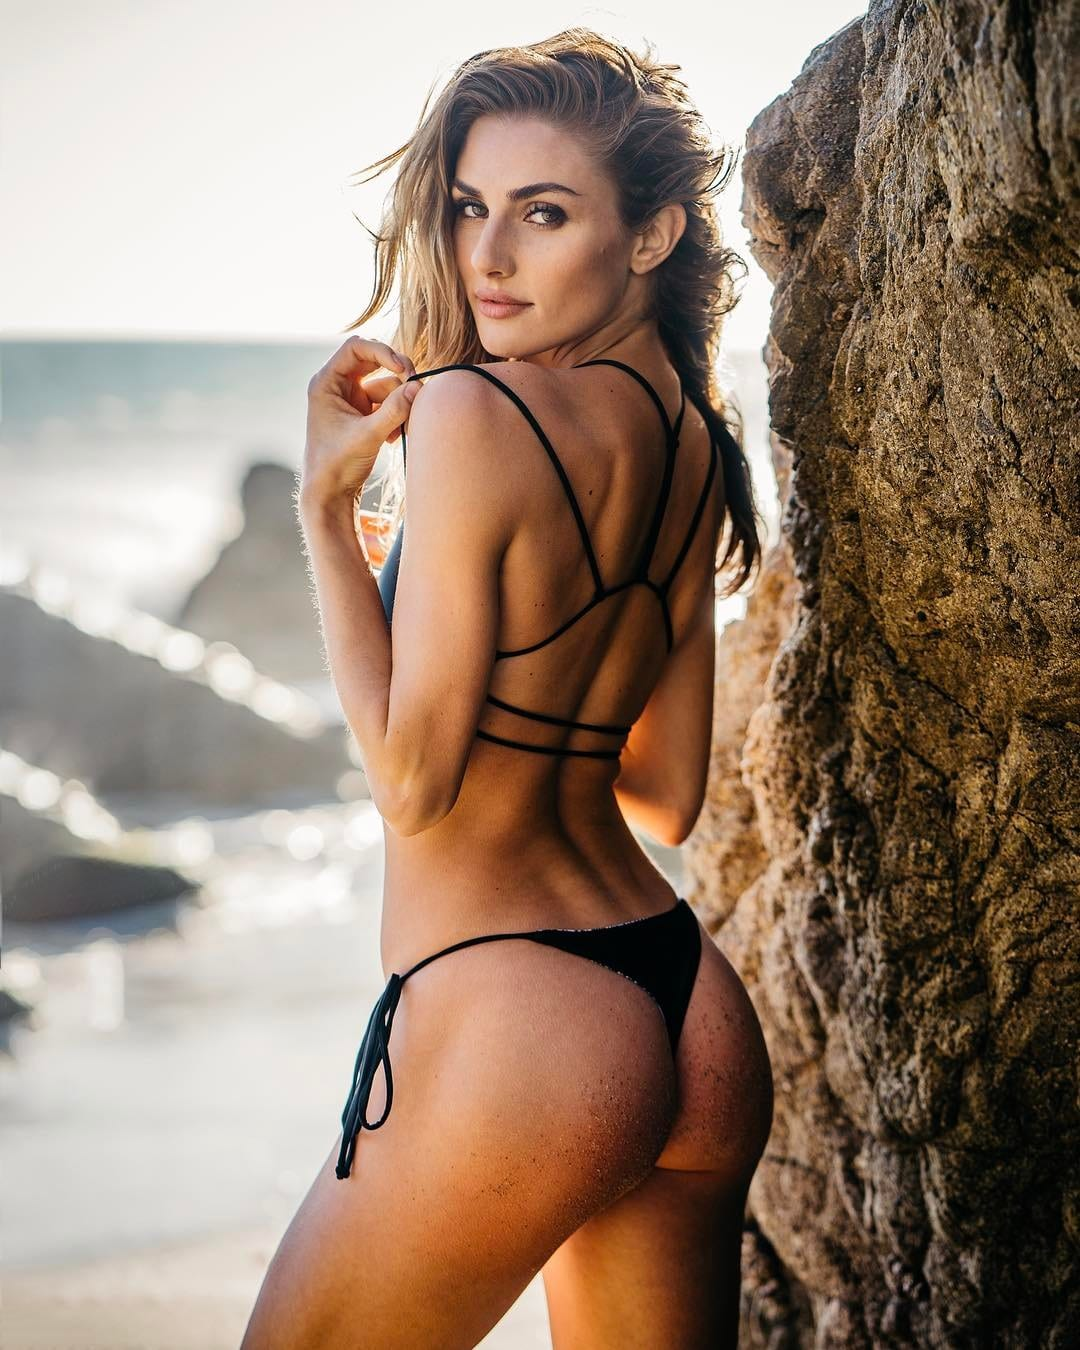 Instagram Feet Mackenzie Thoma naked photo 2017